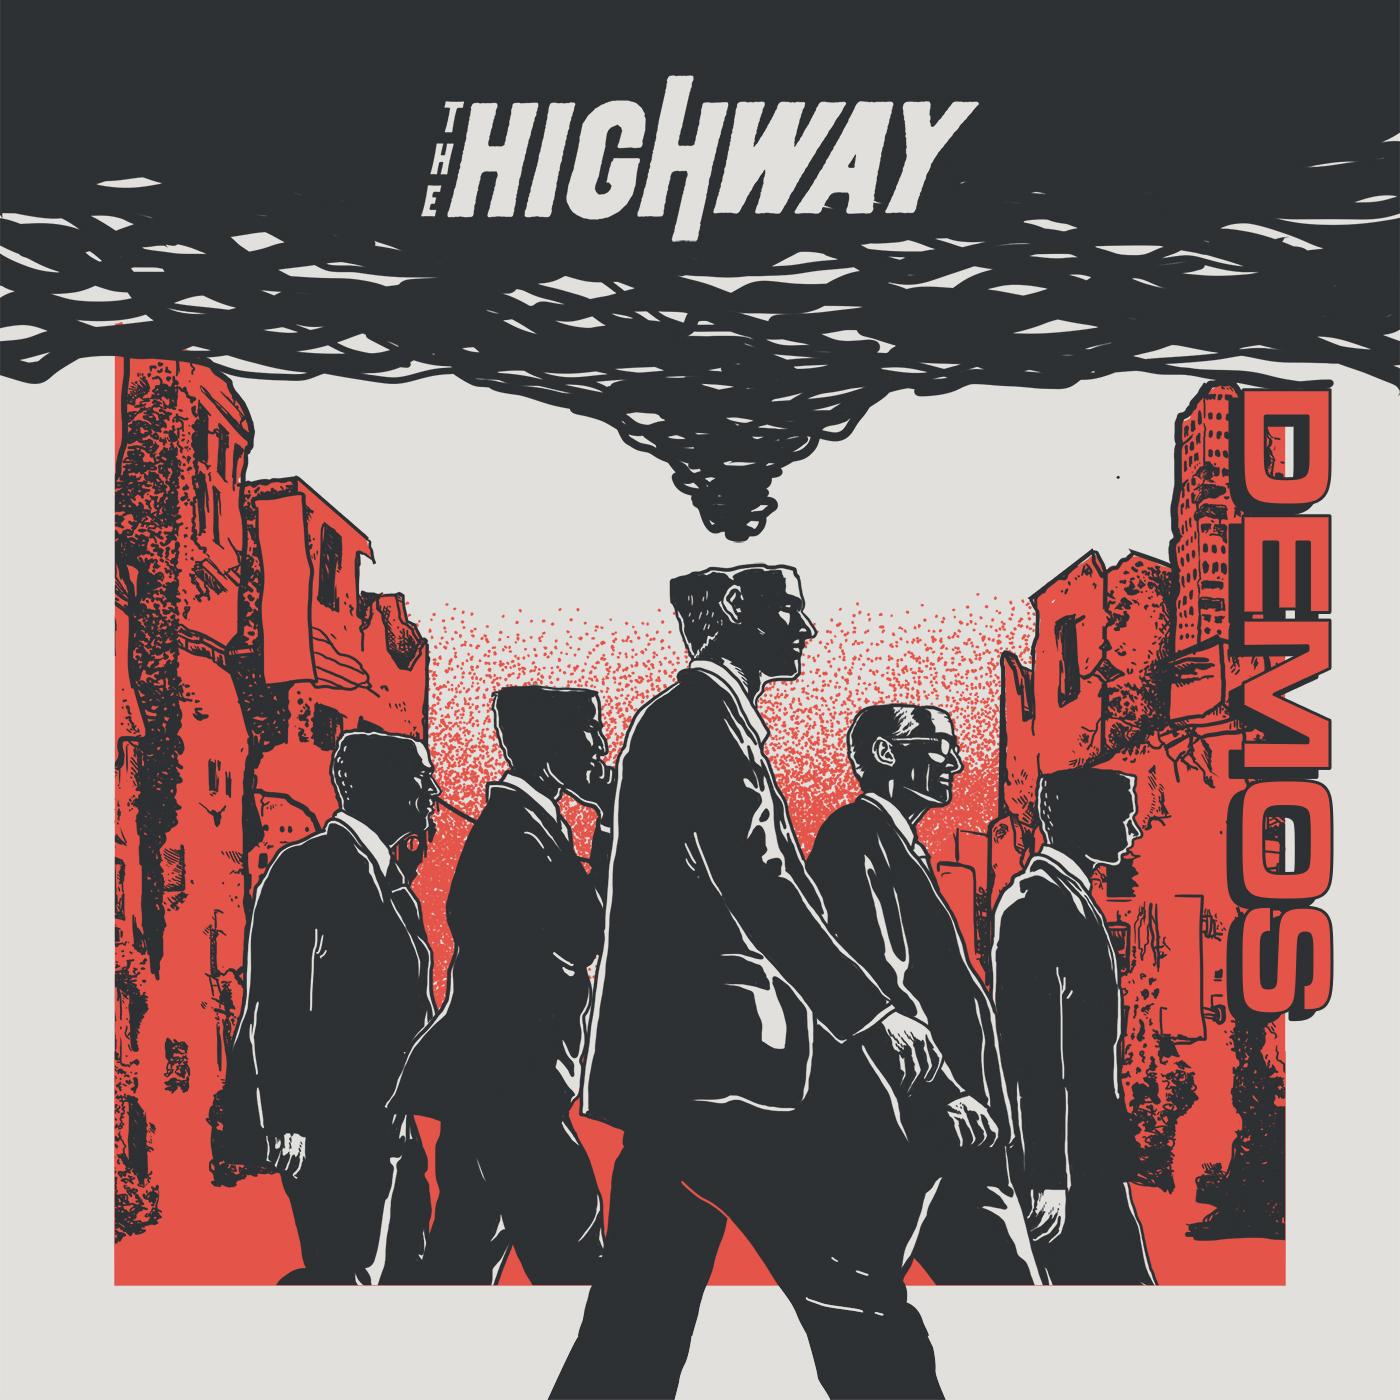 The Highway - Demos